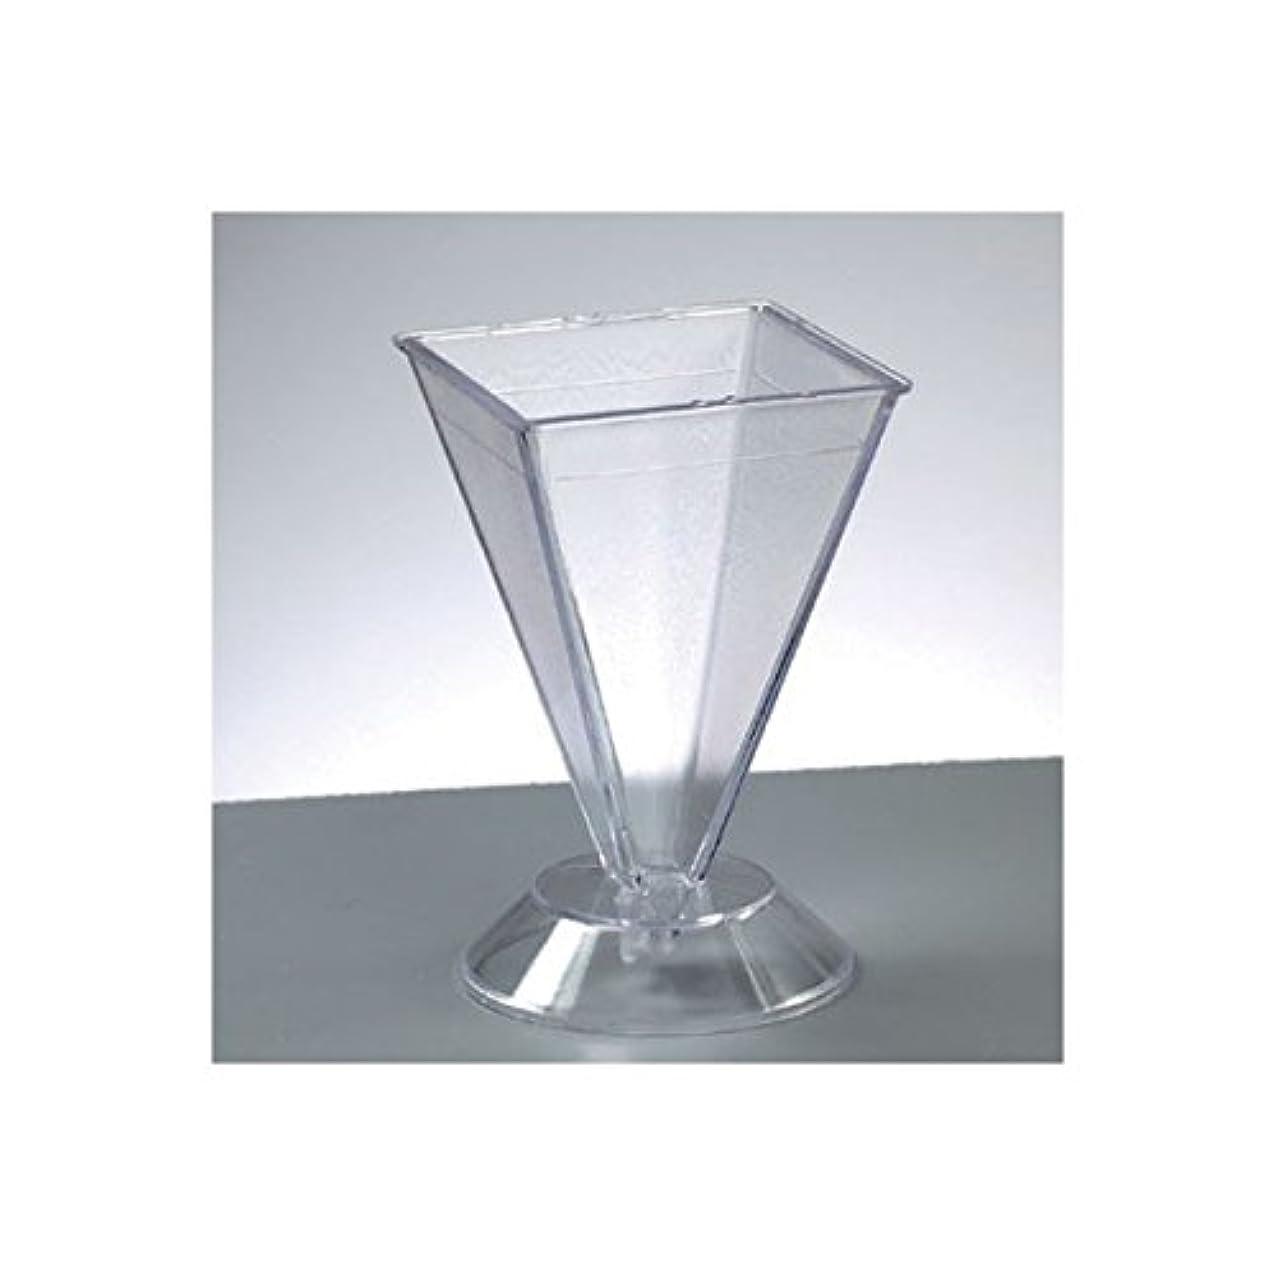 EFCO Pyramid Candle Mould, 105 x 67 x 67 mm by Efco